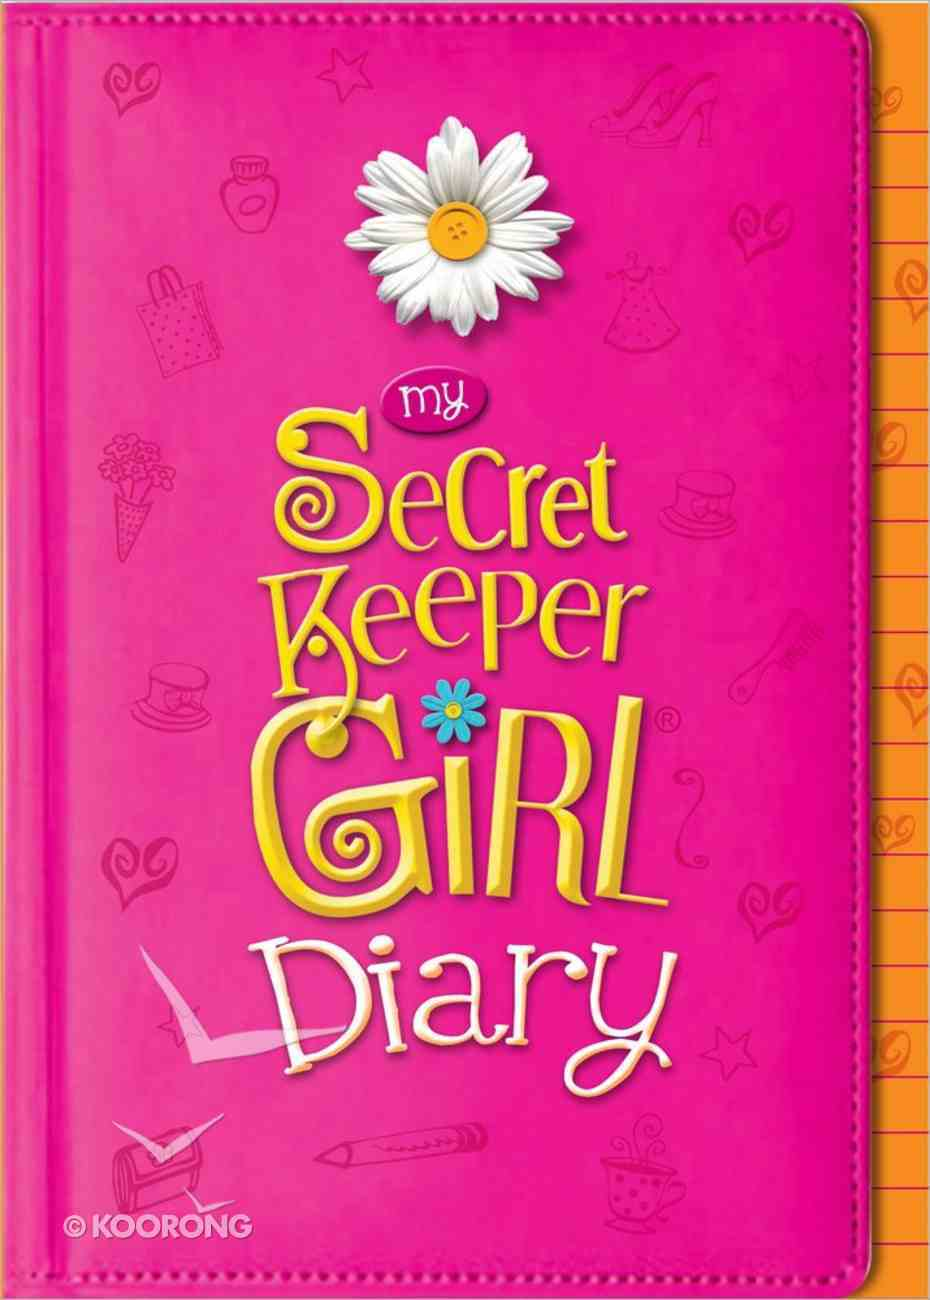 Diary (Secret Keeper Girl Series) Paperback